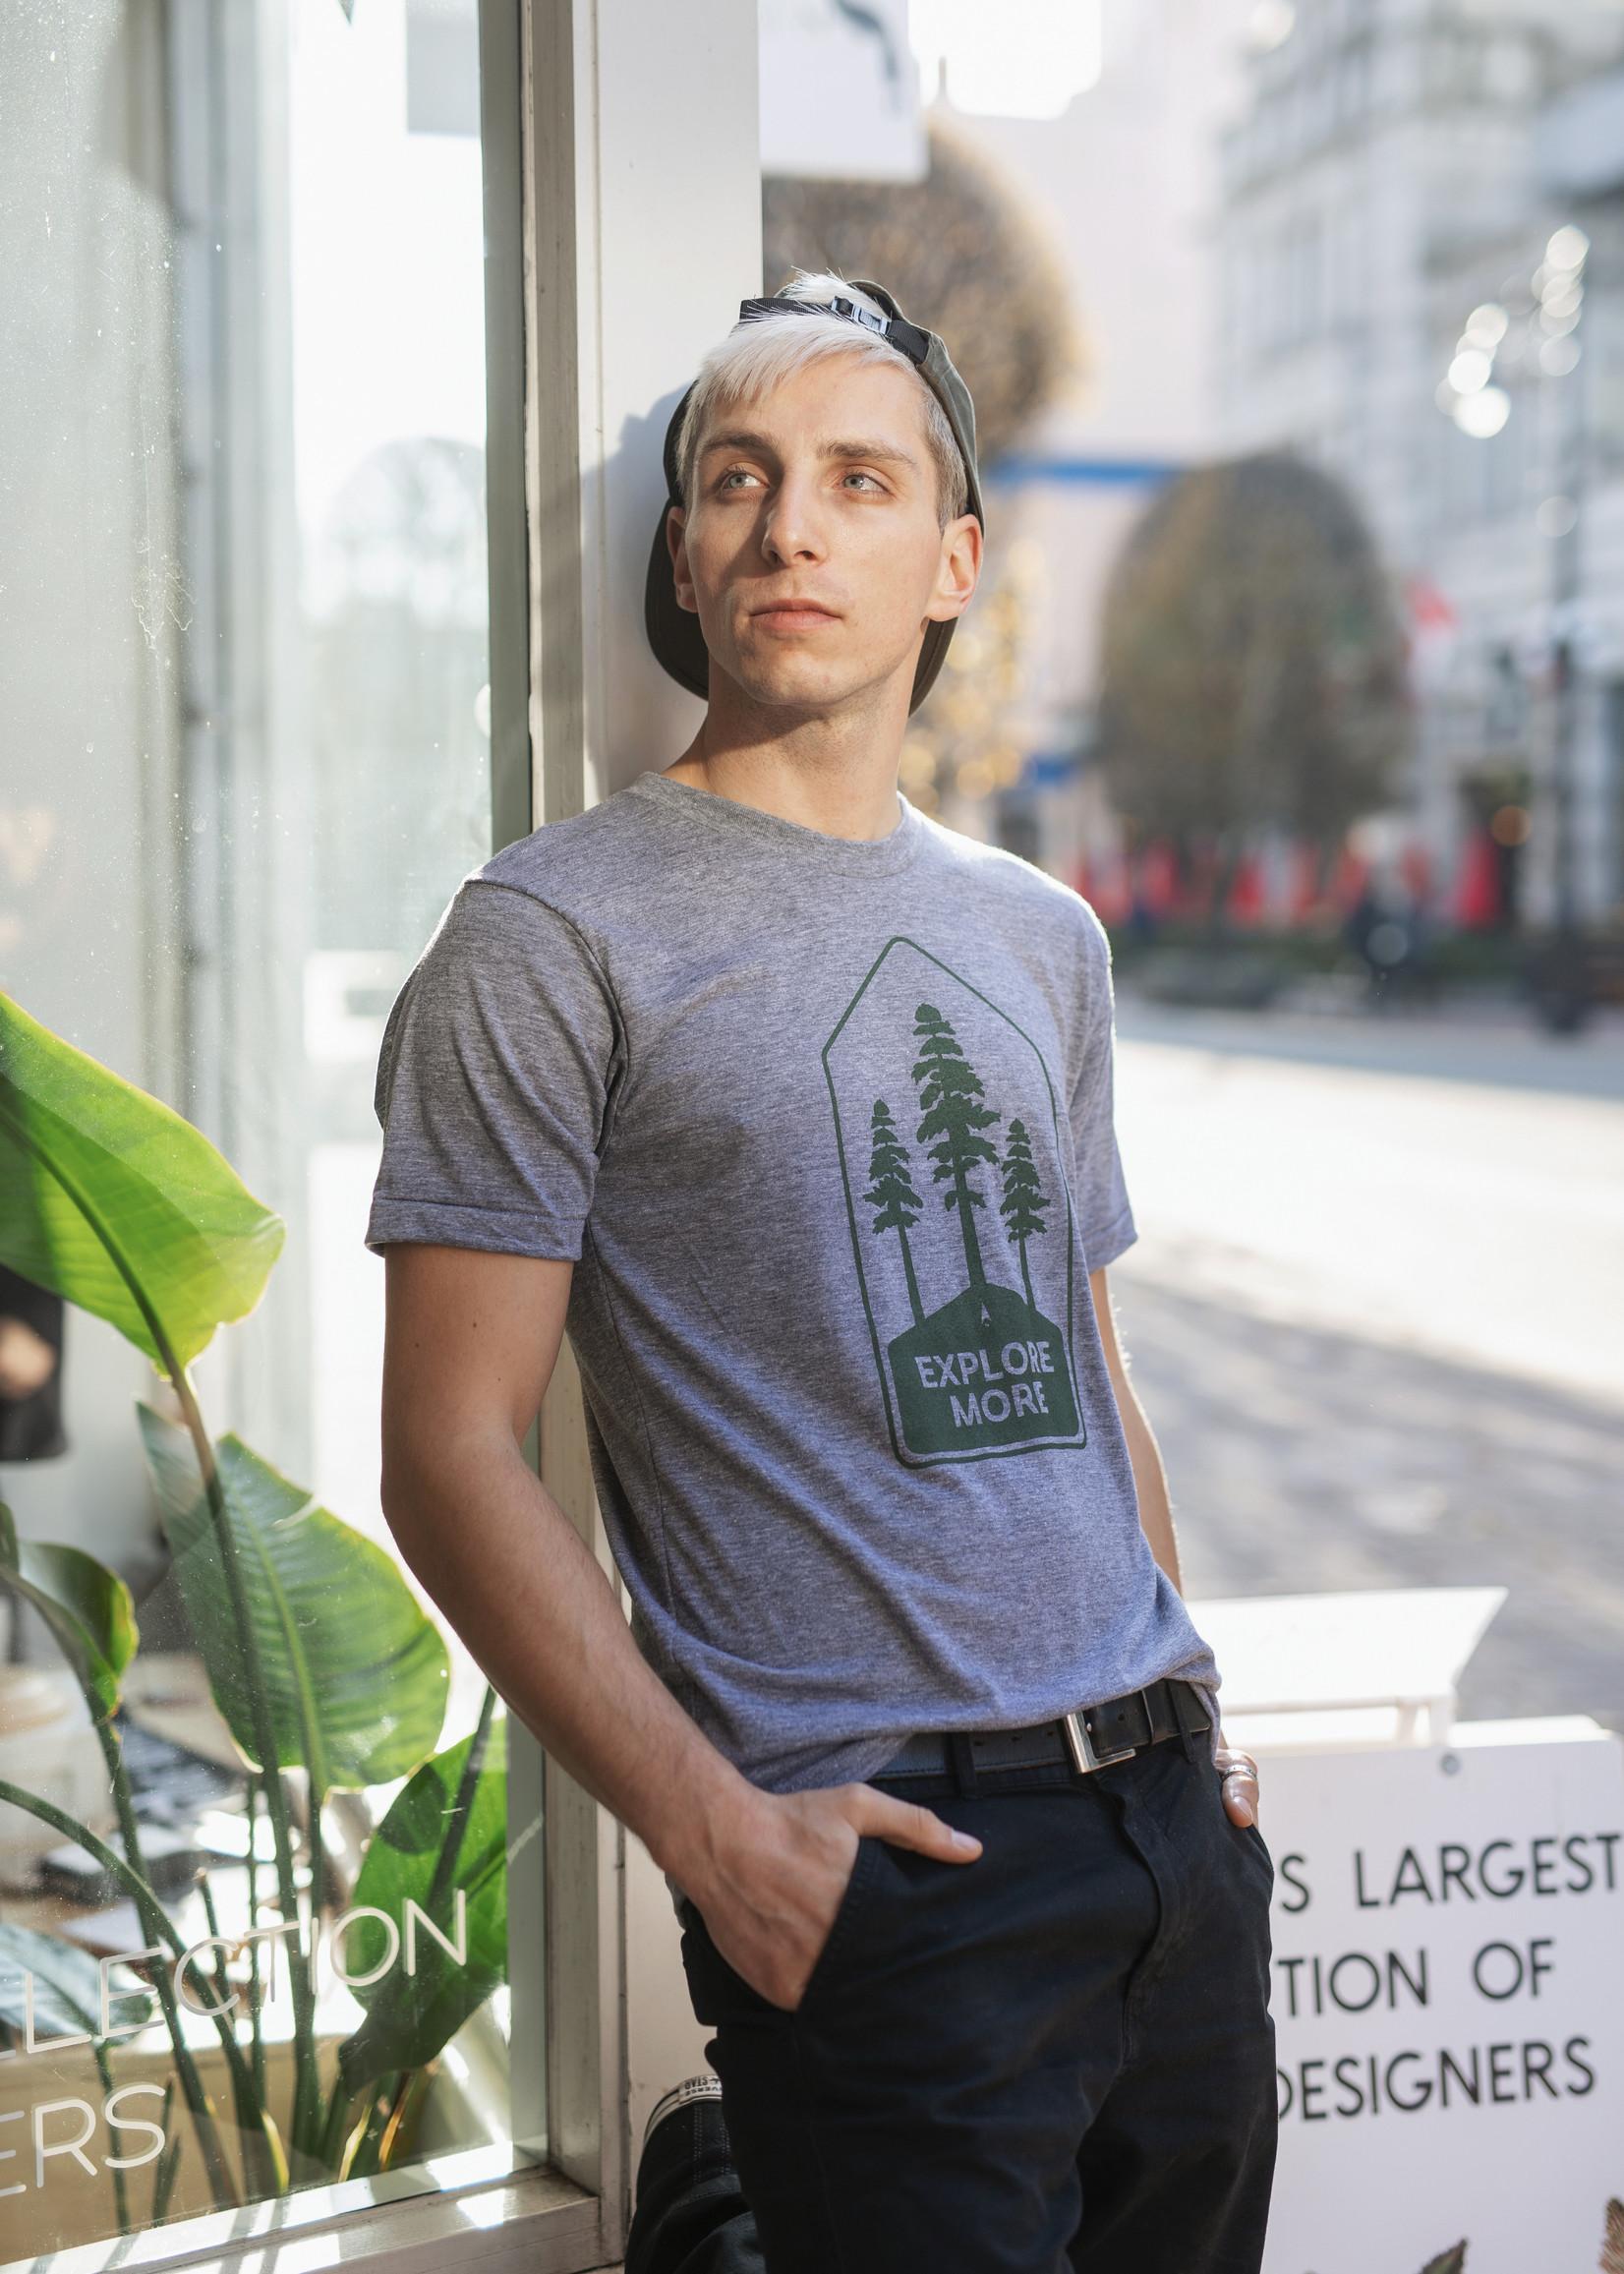 Locomotive - Explore More T-Shirt